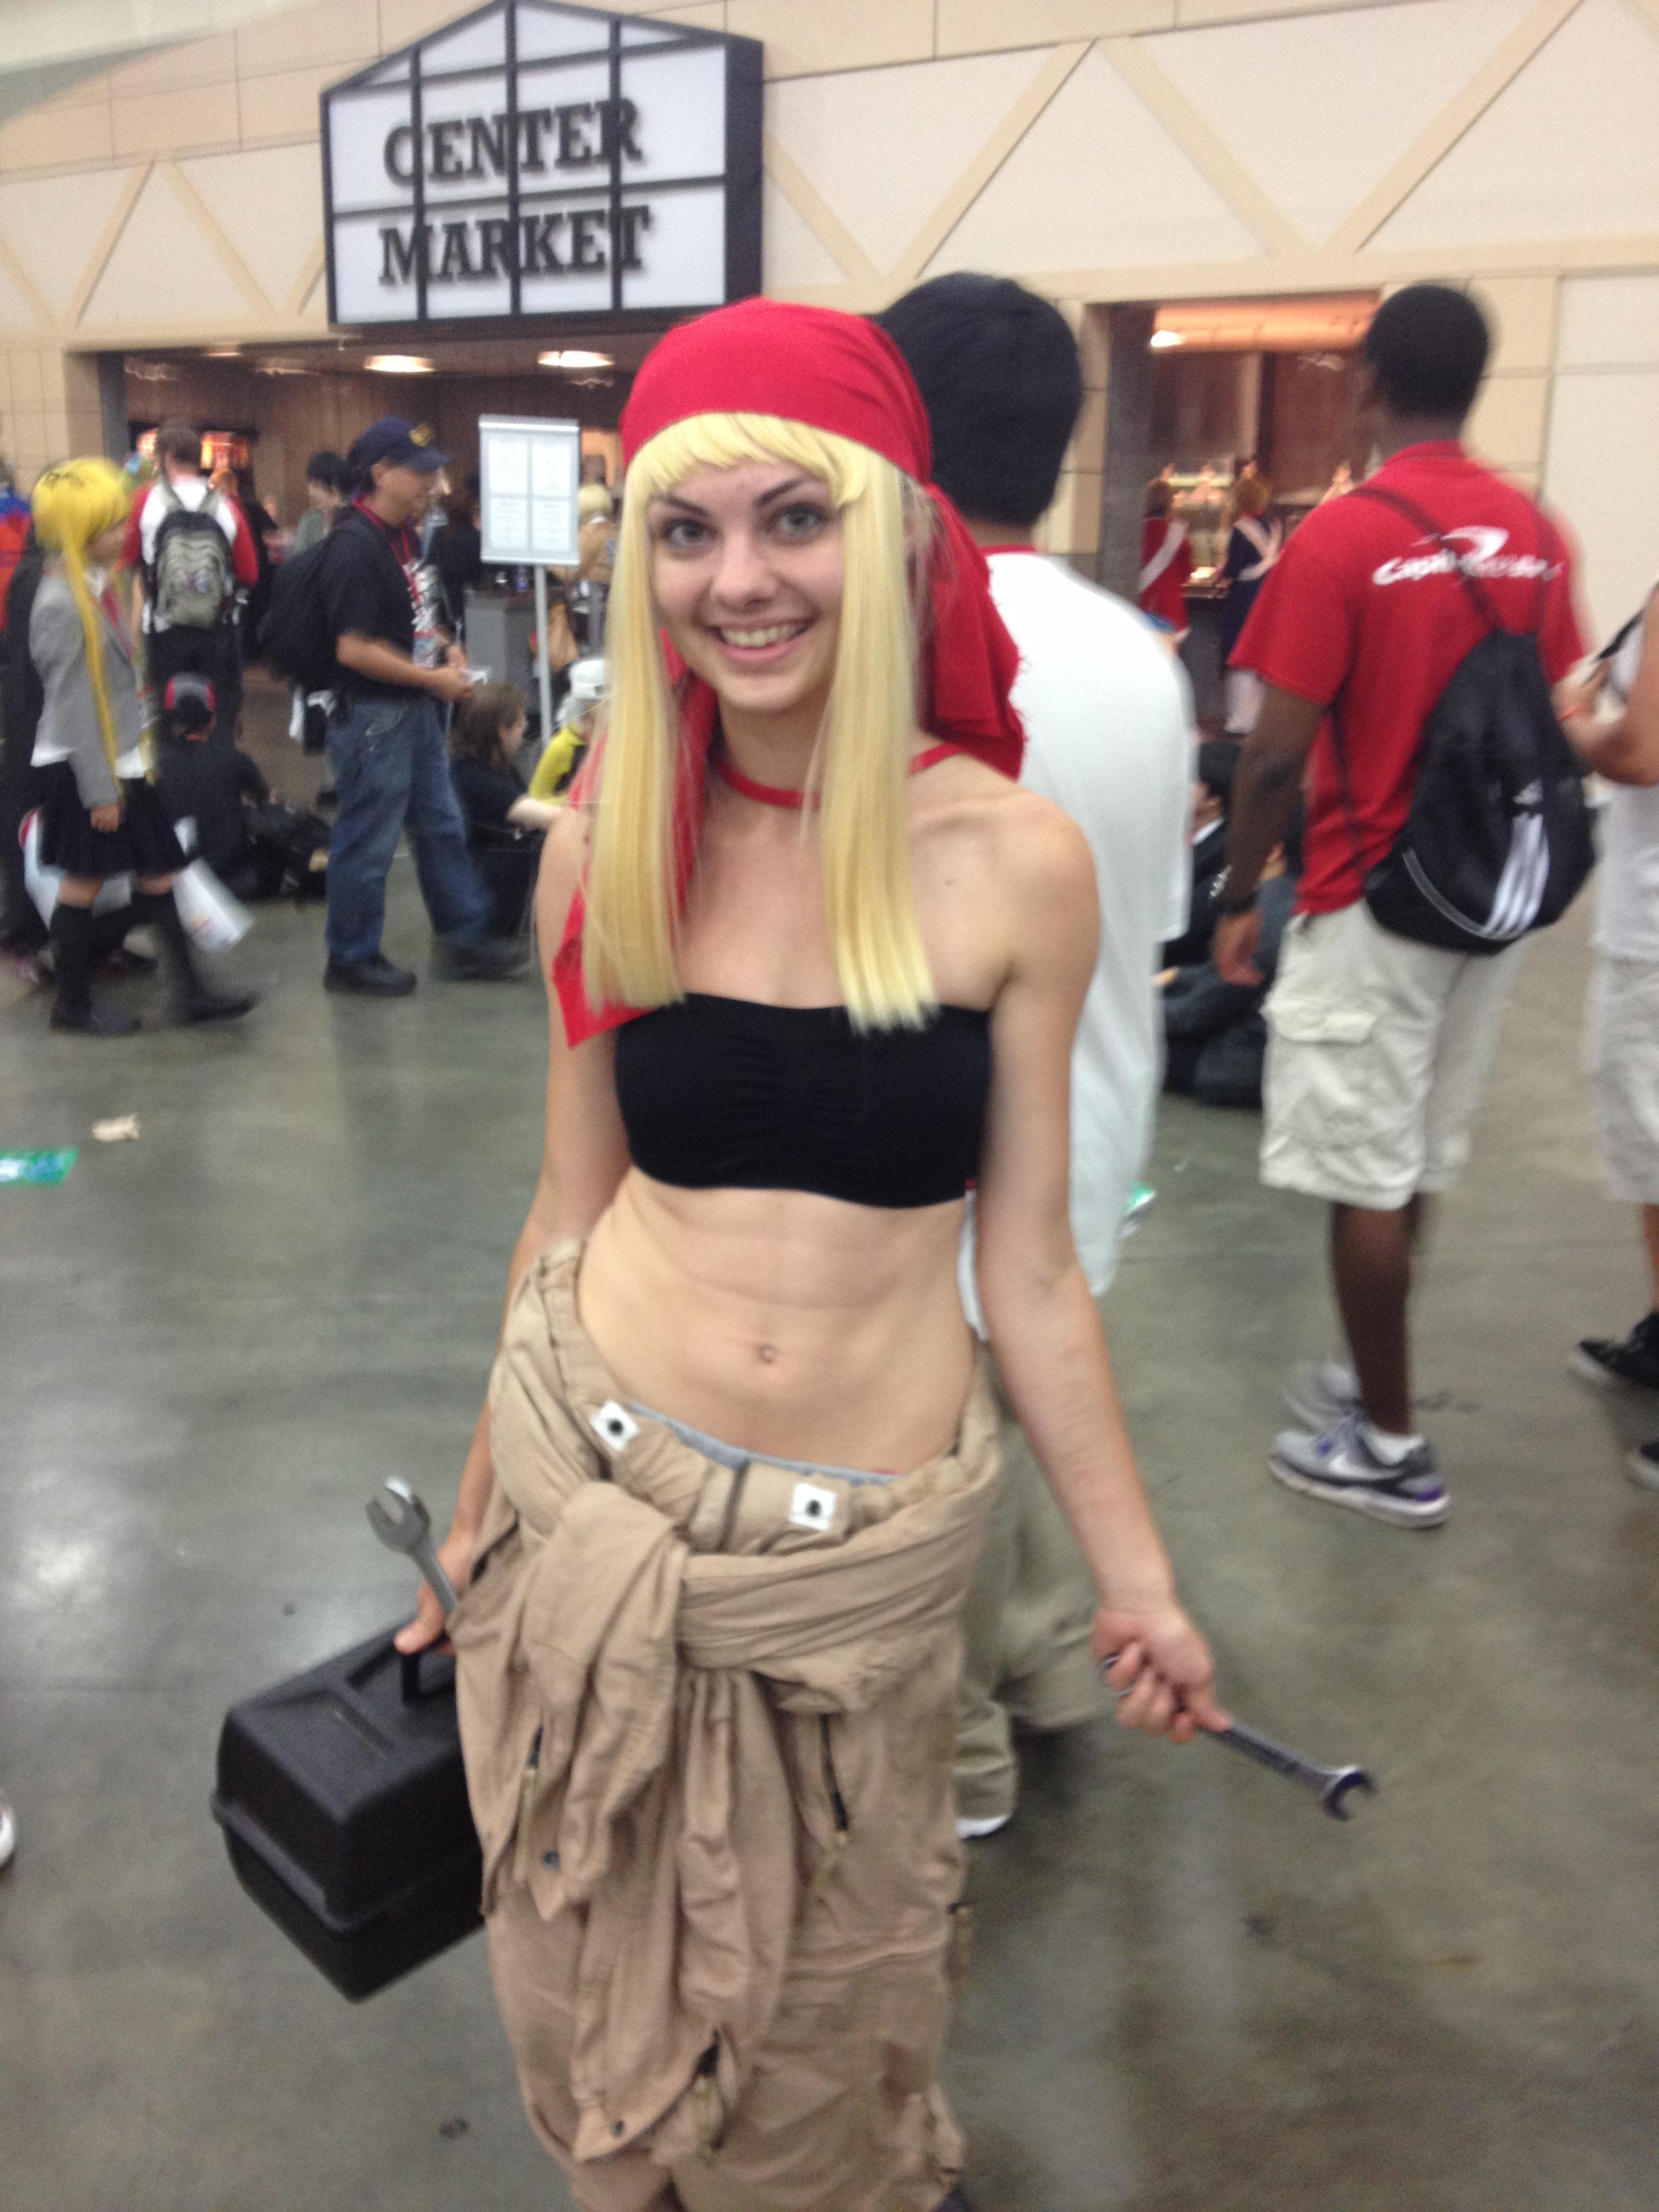 Cosplayer as Winry Rockbell from Fullmetal Alchemist